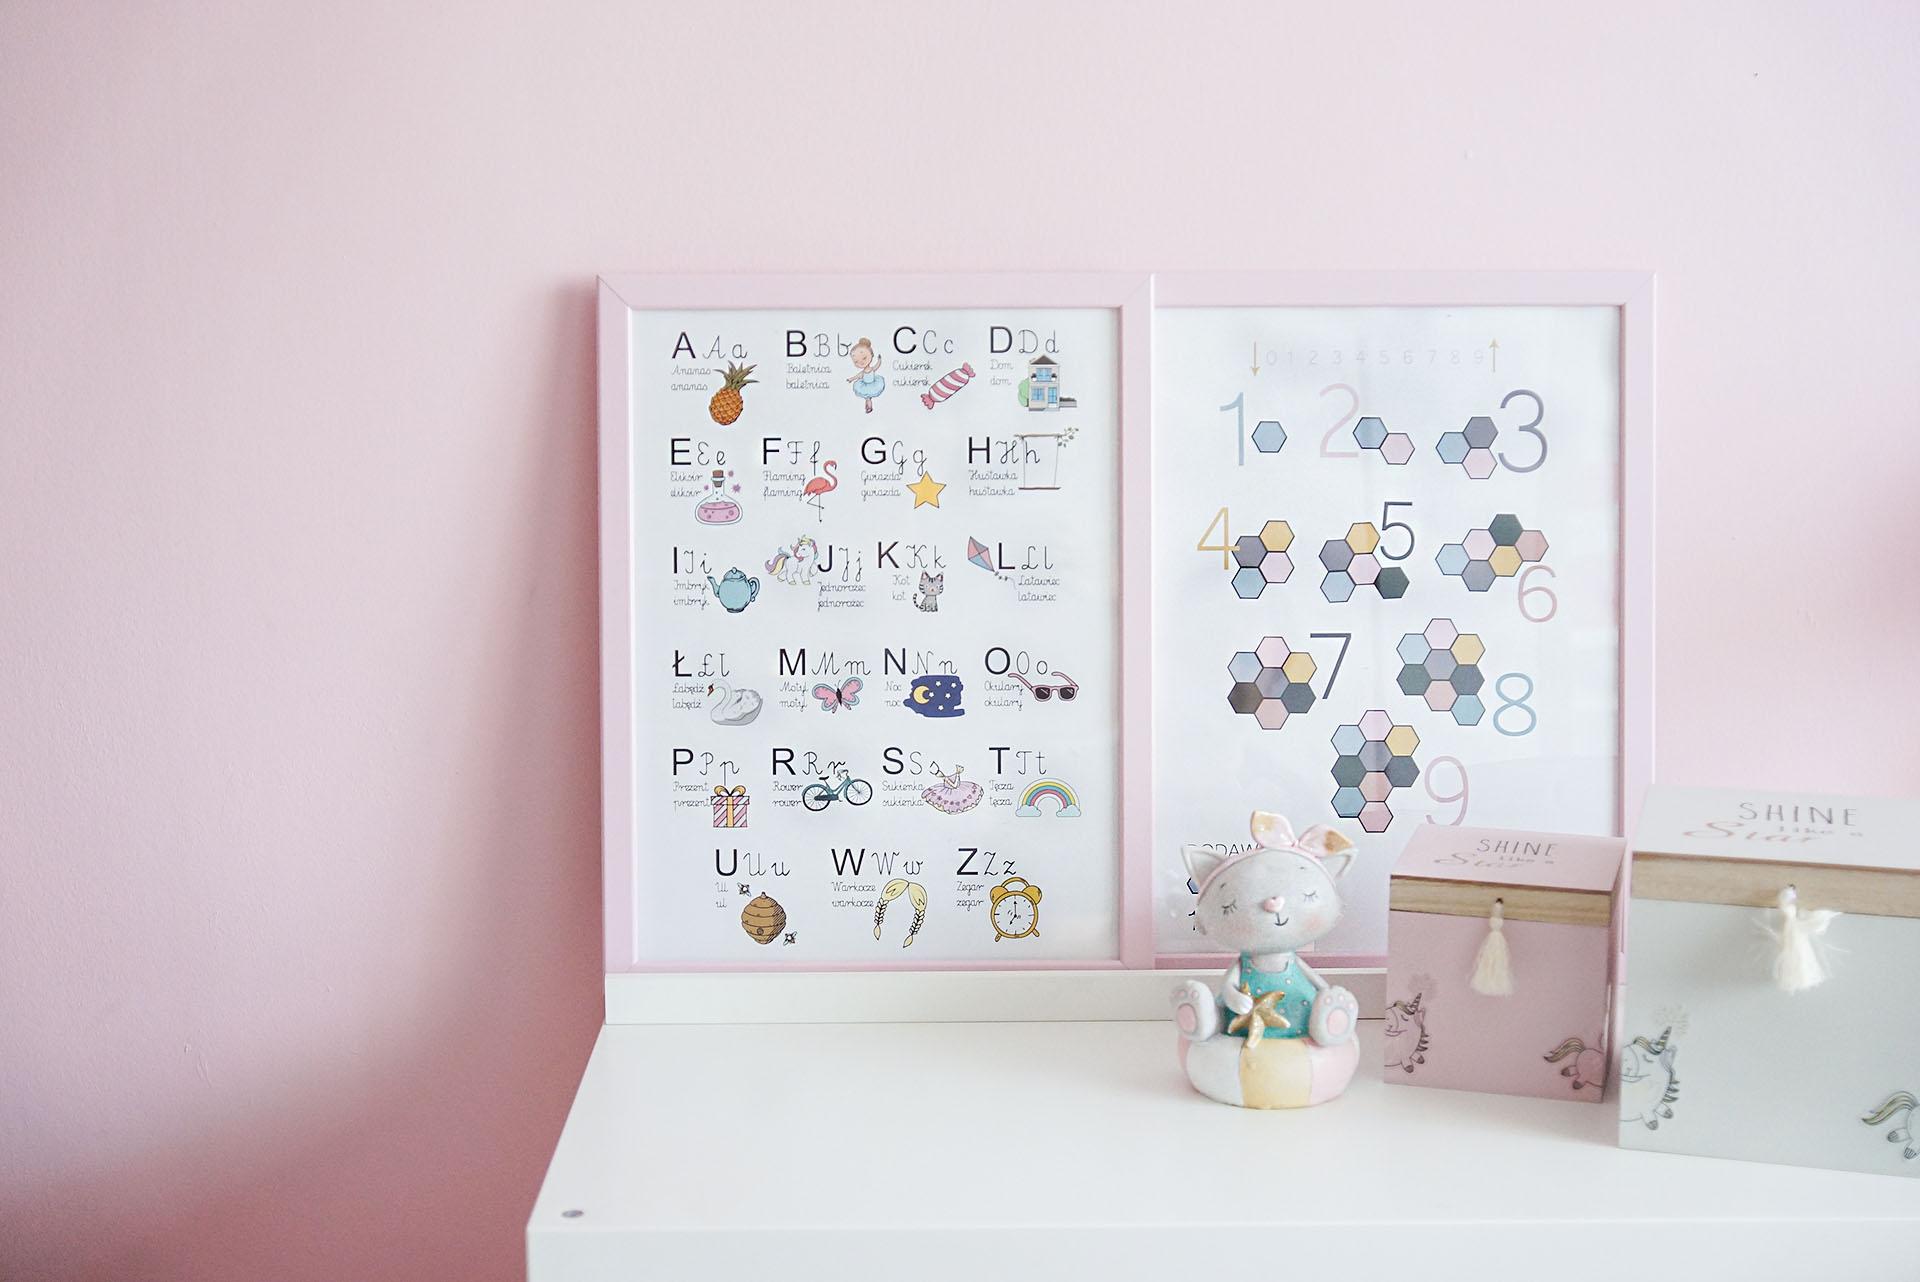 pokój dziecka, plakat alfabet, polski alfabet, plakat edukacyjny, plakat dla dziecka, plakaty dla dzieci